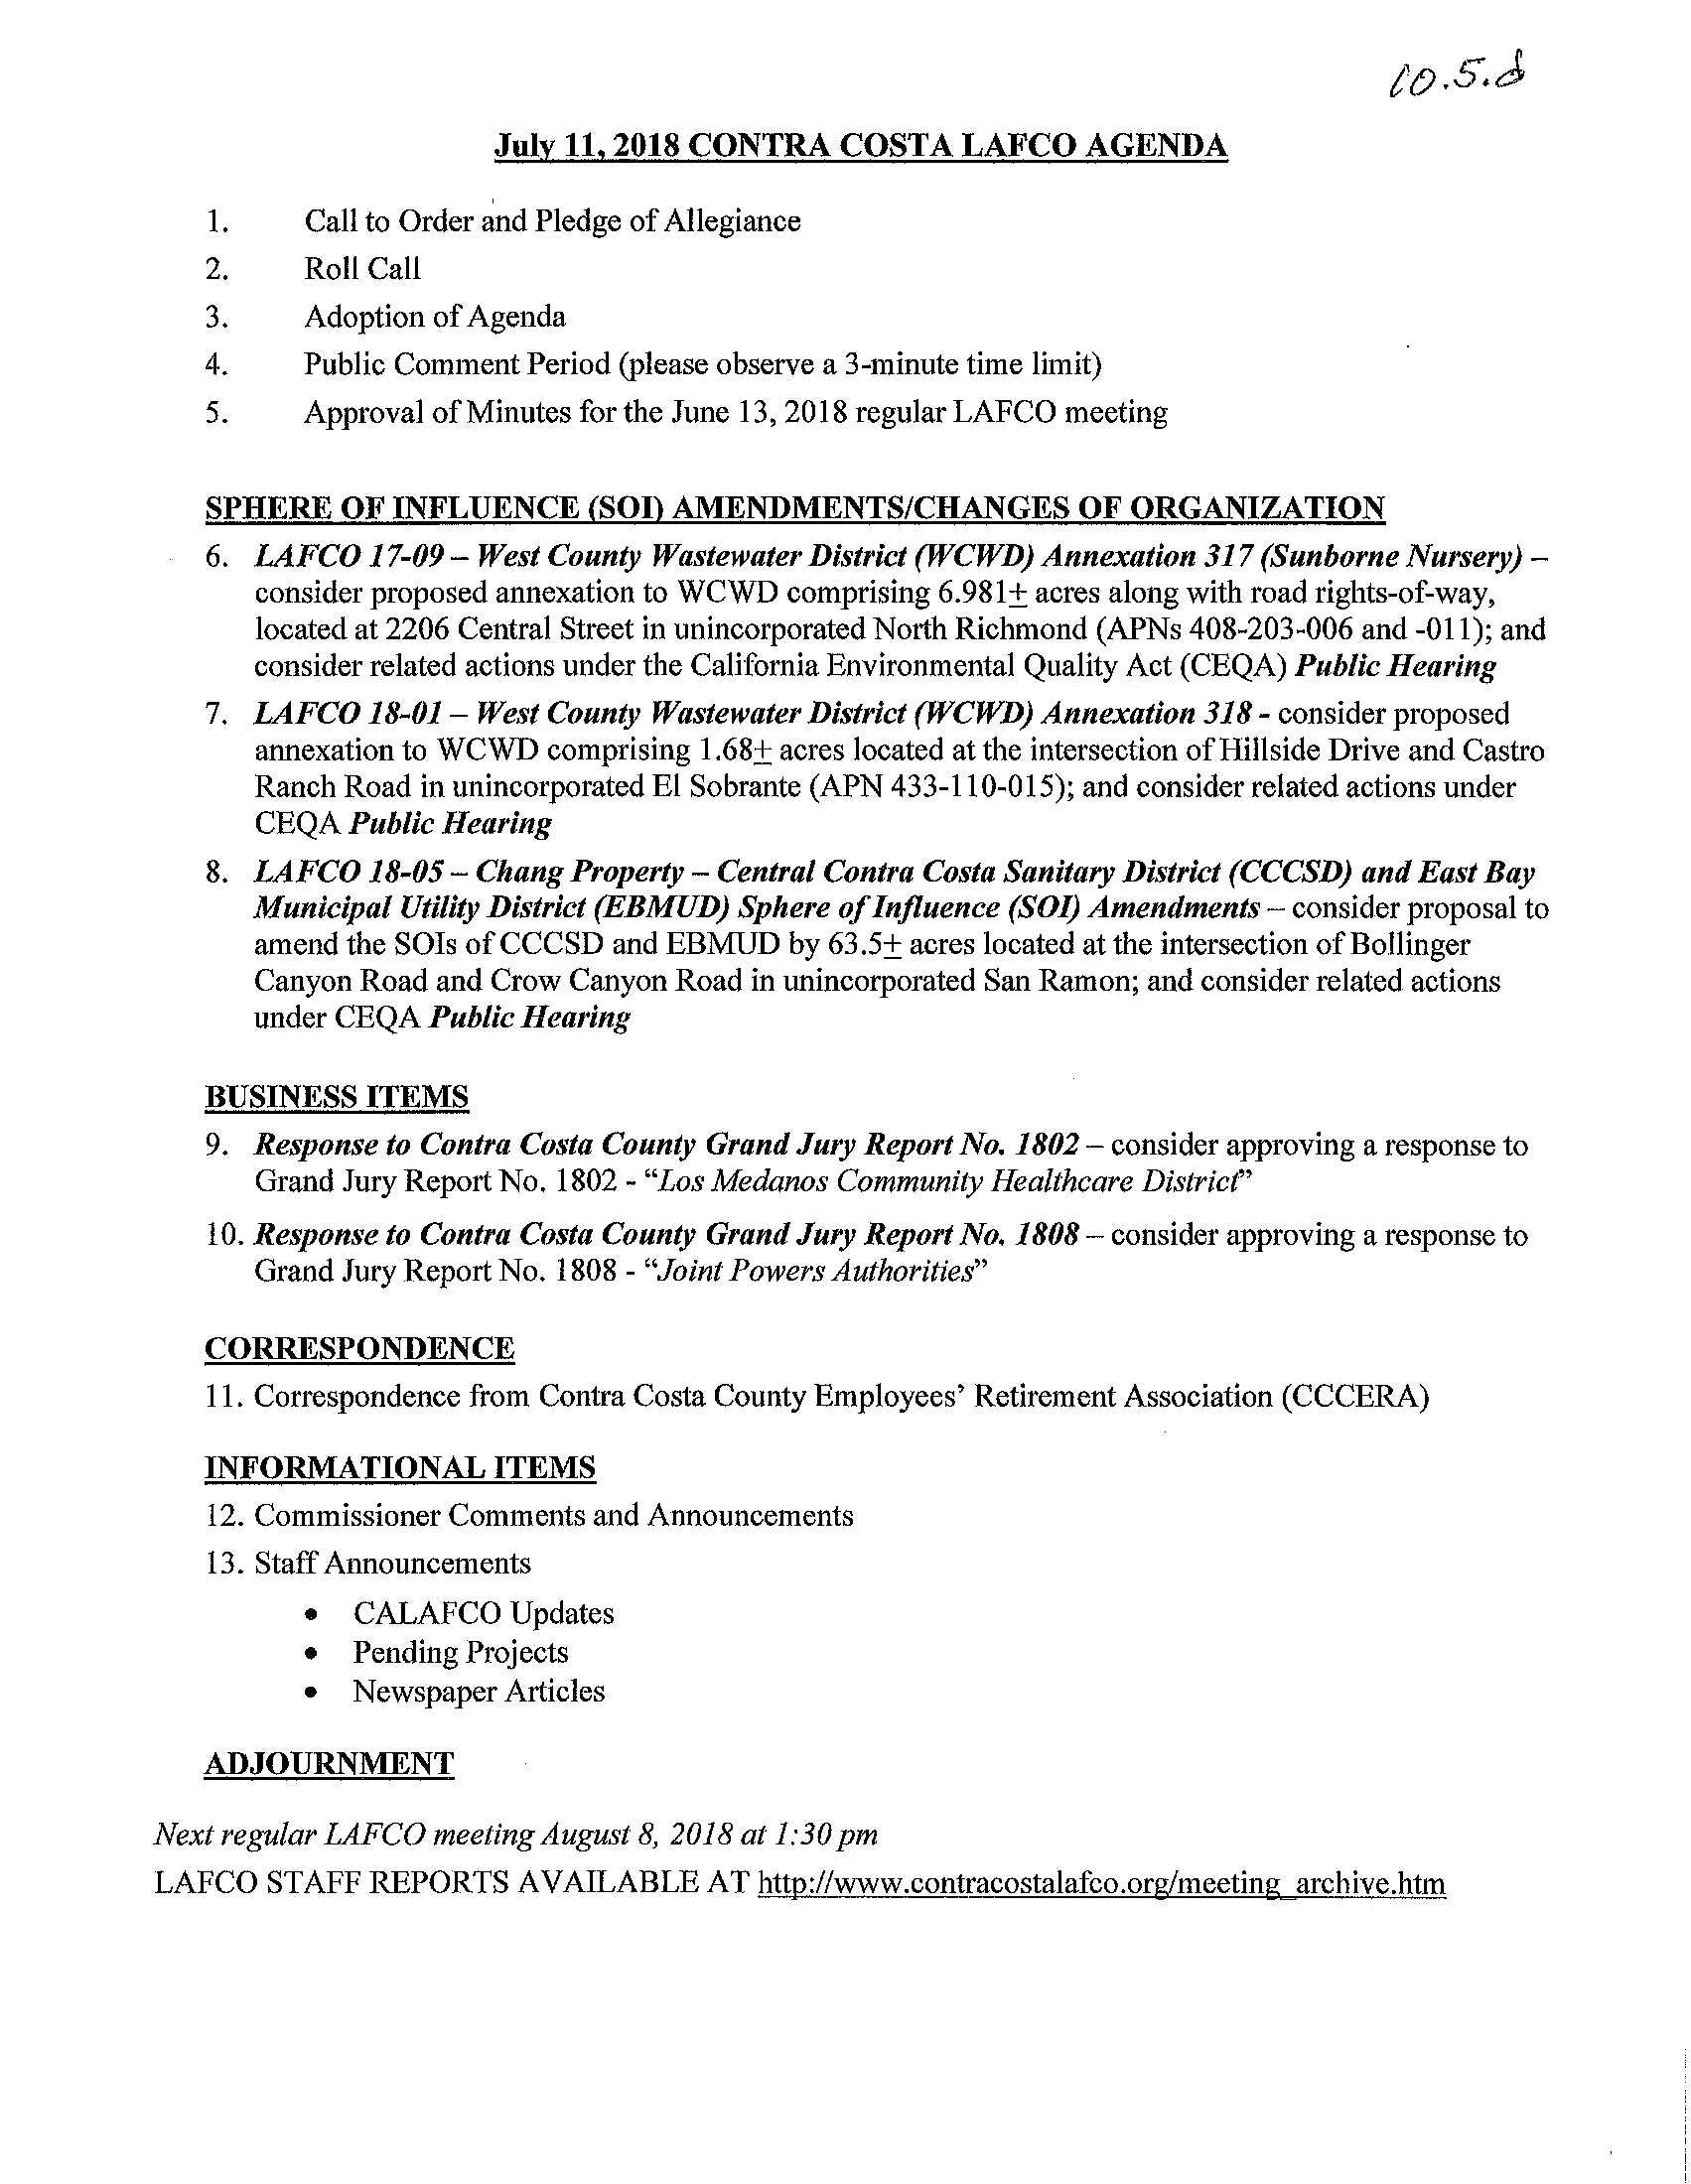 ESMAC Agenda 7.11.2018 (36 Pages)_36.jpg